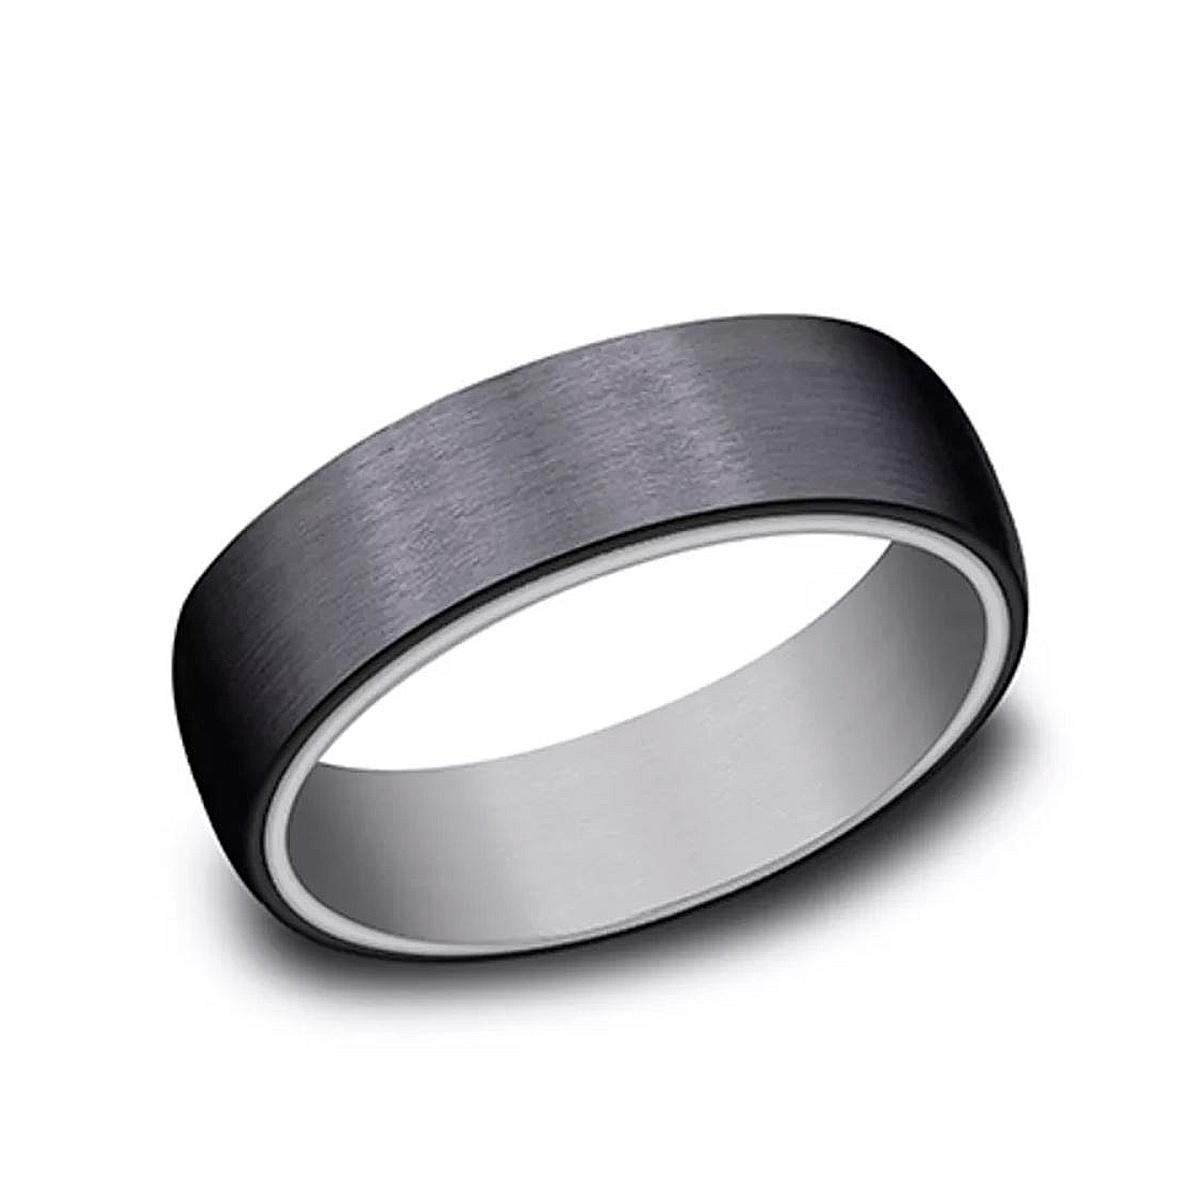 CRJ-190502-benchmarkrings_0002_tantalum3_contemp_6.5mm_multimetal